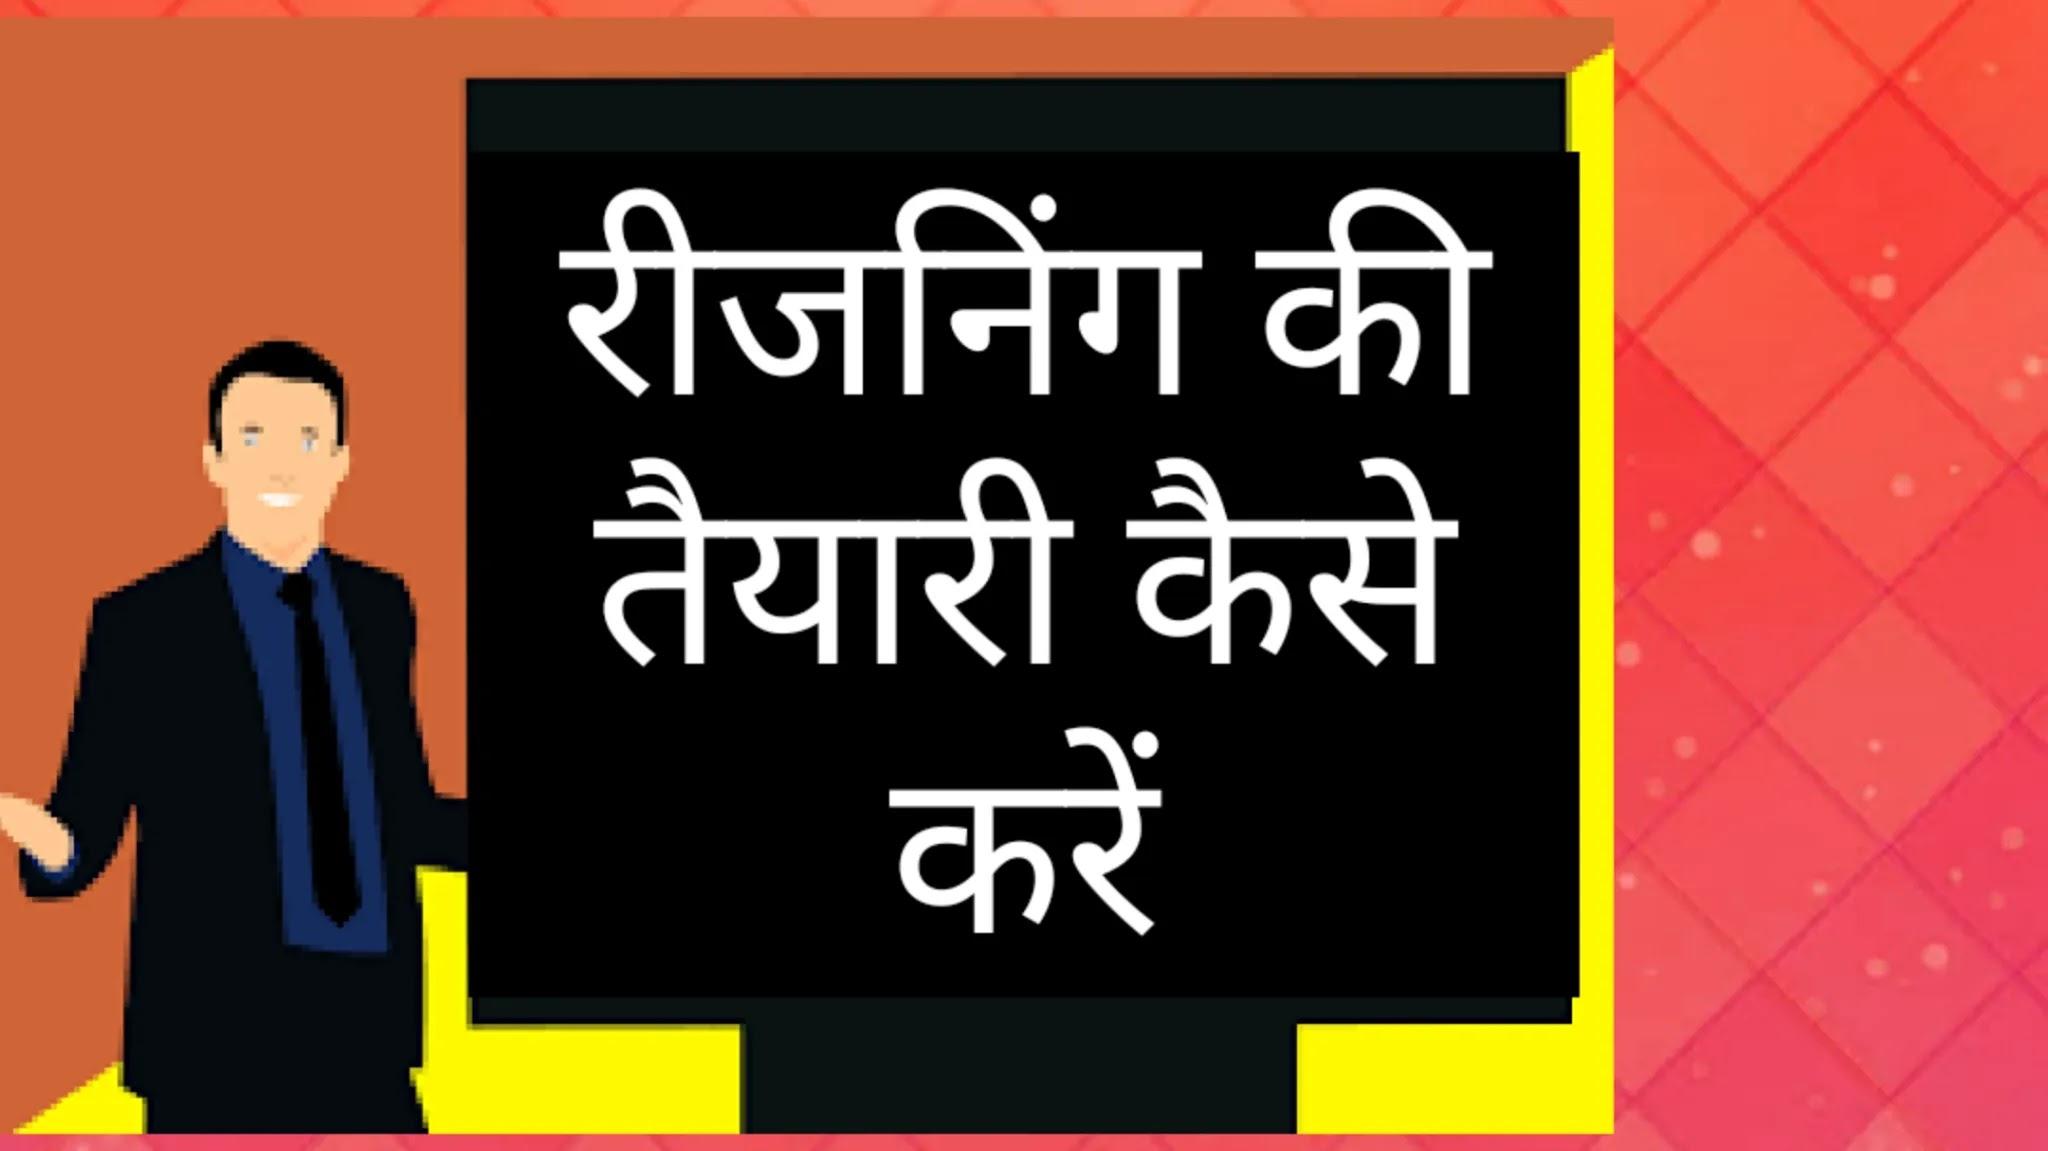 रीजनिंग की तैयारी कैसे करें, How to Prepare Reasoning in Hindi, Reasoning ki Taiyari Kaise Karen, Sarkari Naukri ke Liye Reasoning ki Taiyari Kaise Karen